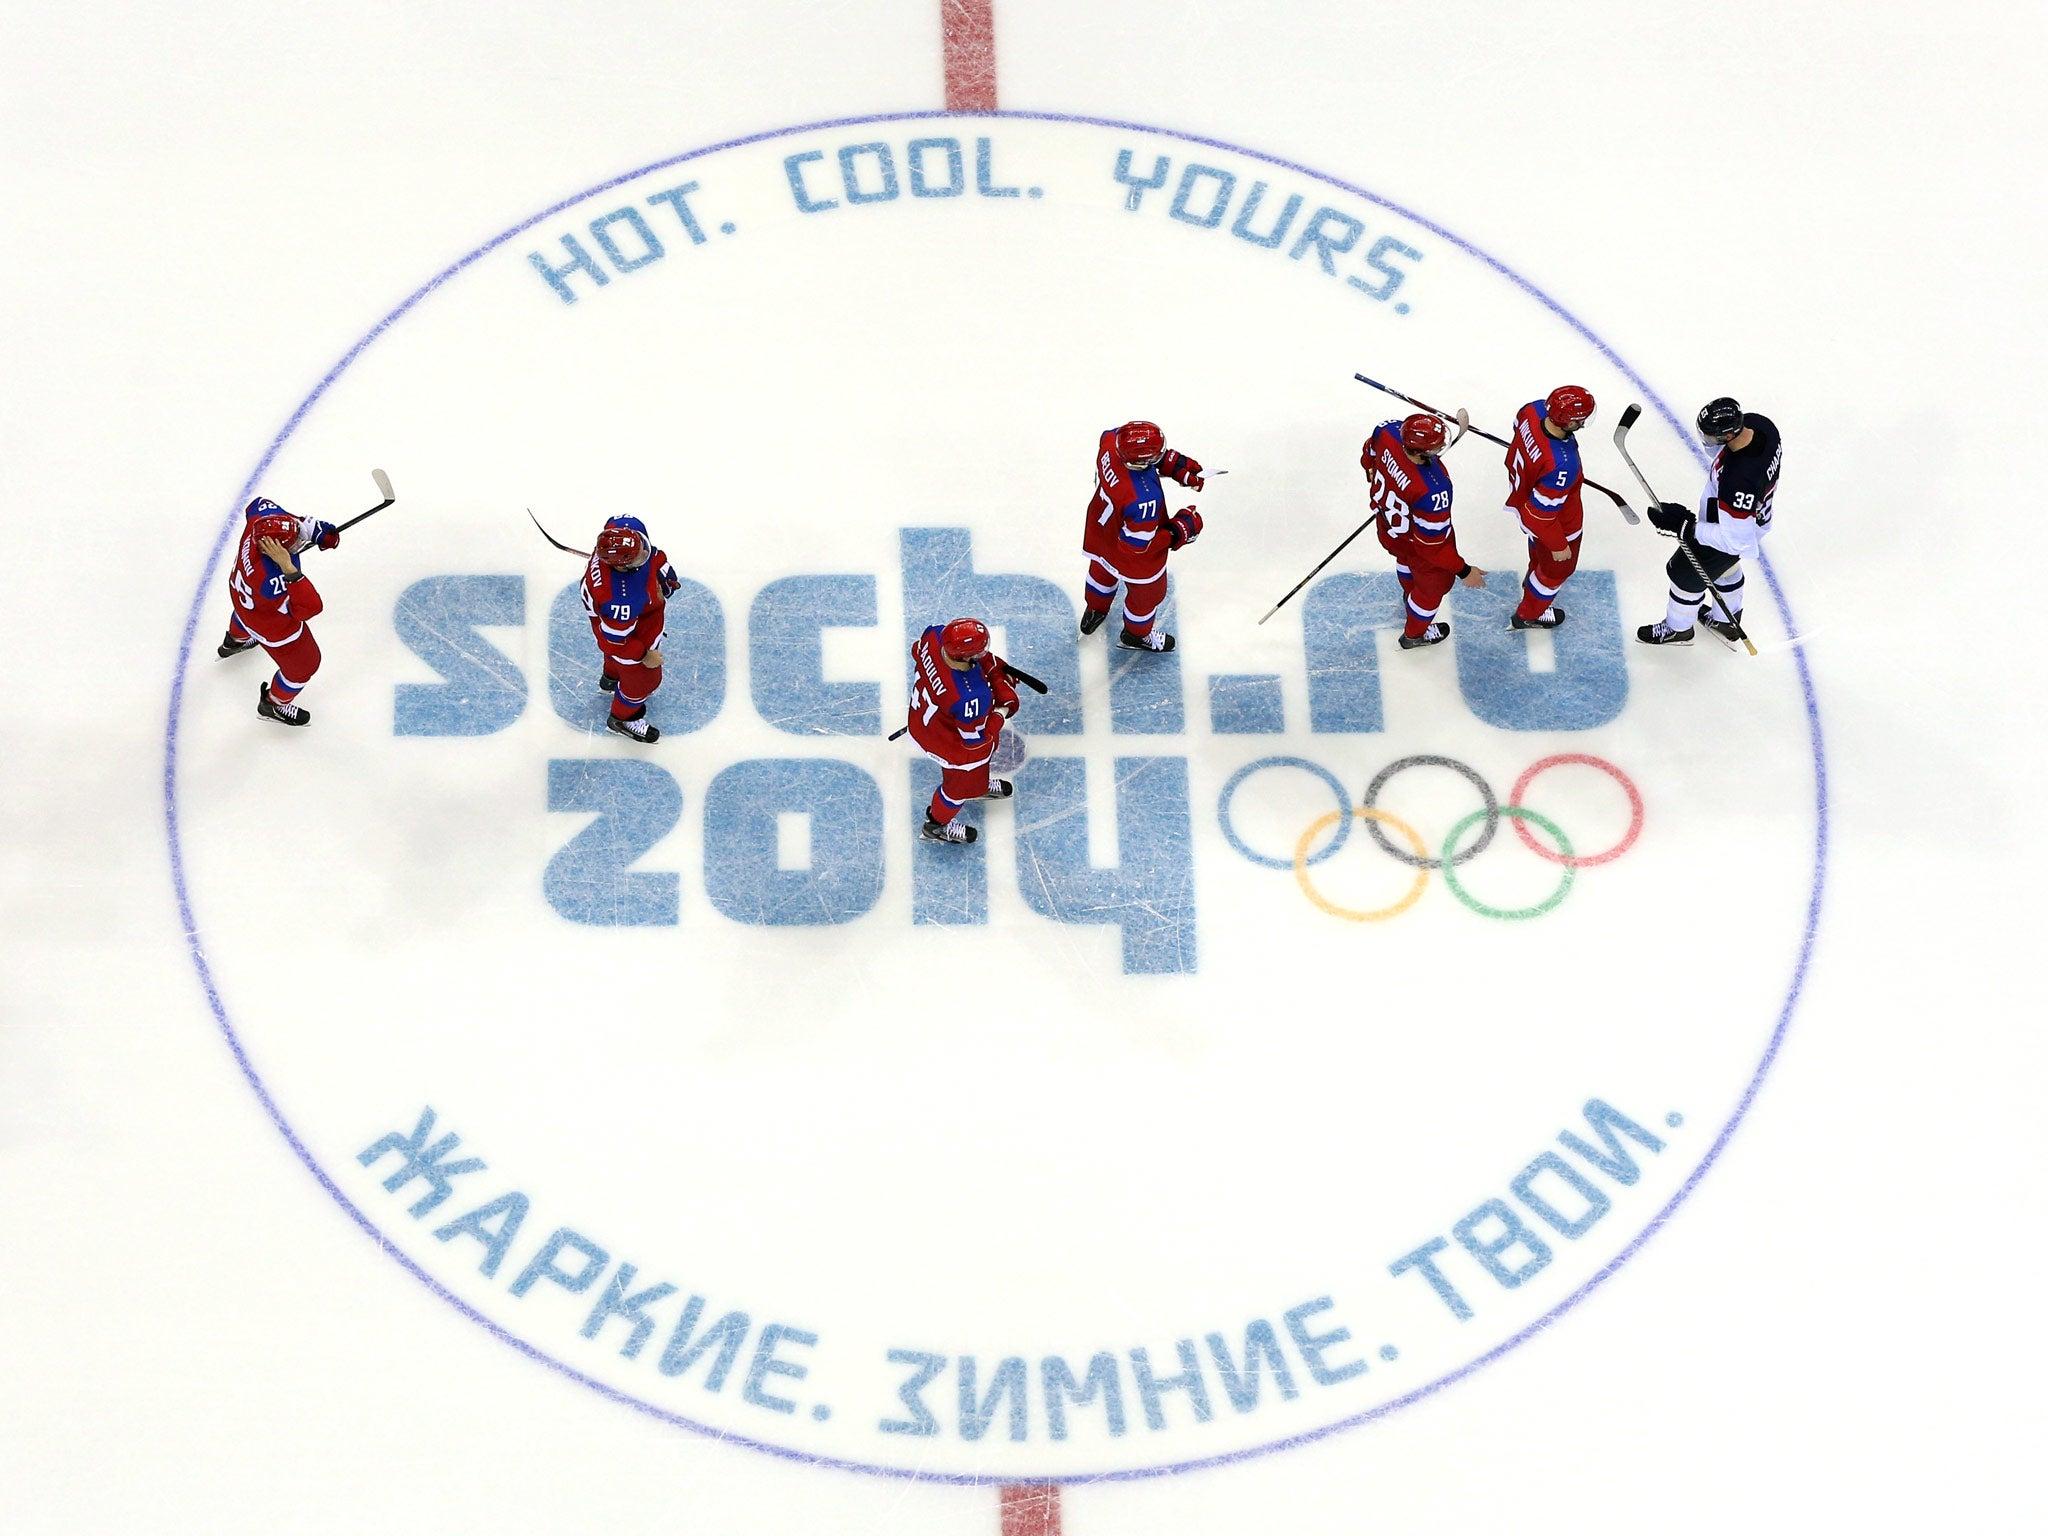 Sochi olympialaiset dating App